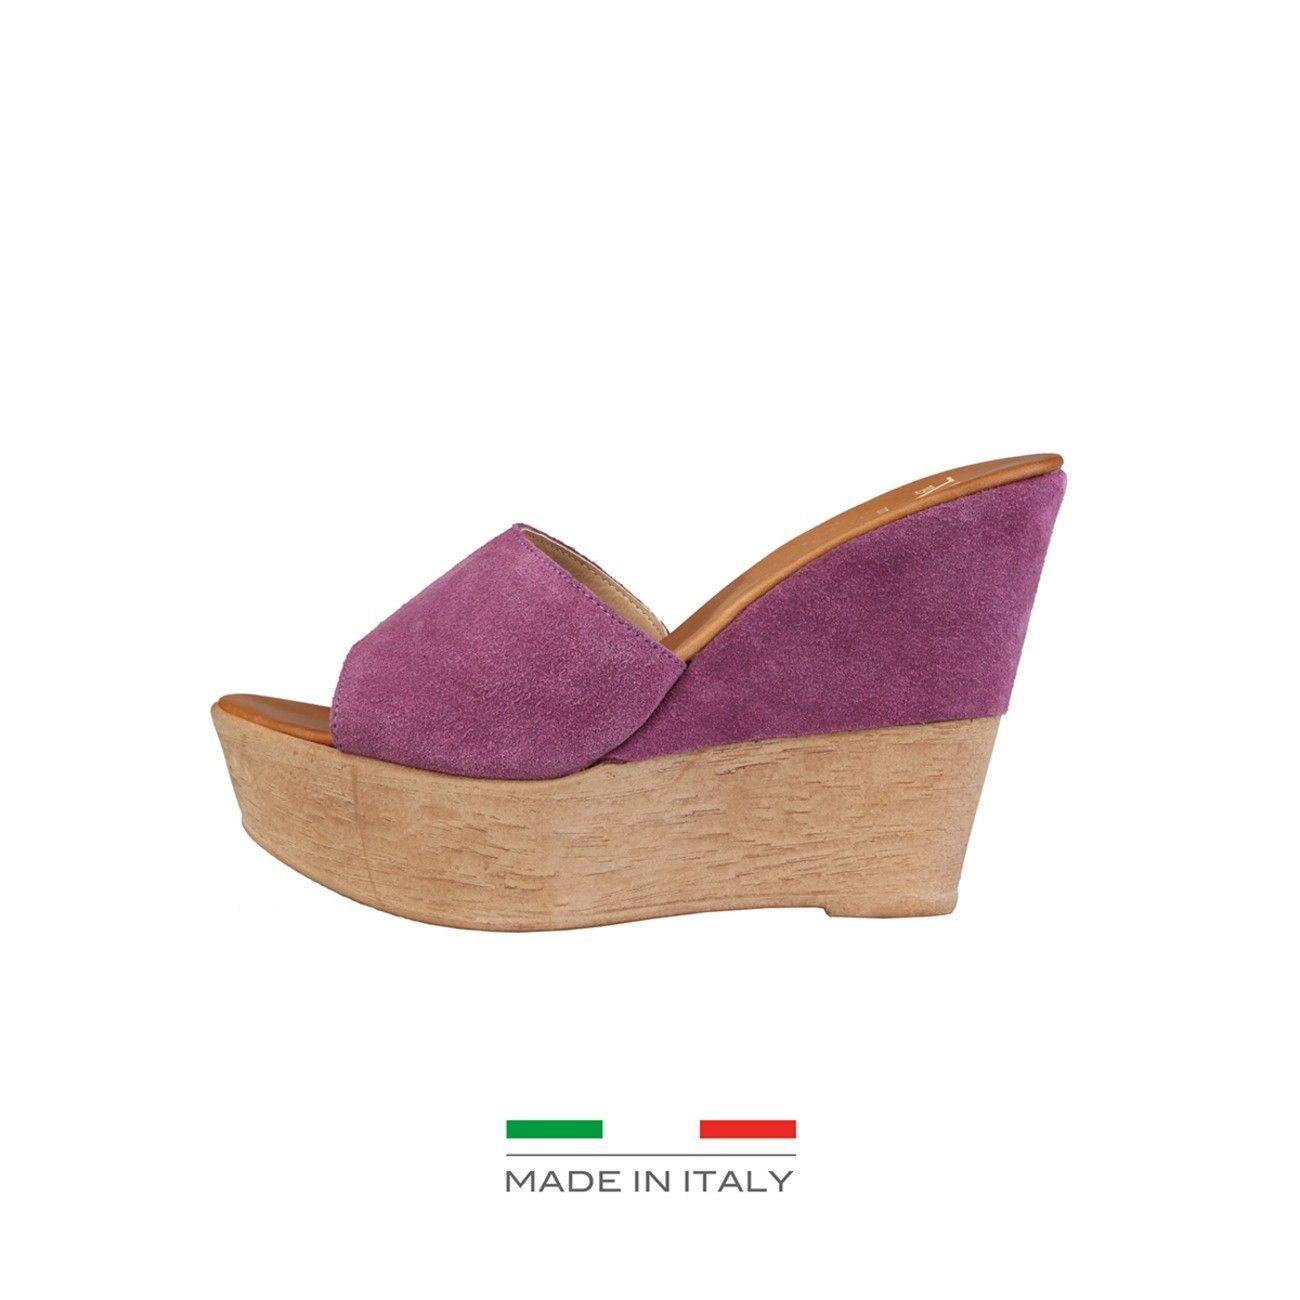 <p><br /> Chaussures pour femmes Versace 1969 Abbigliamento Sportivo srl Milano Italia<br /><br /> - Semelle compensée<br /><br /> - empeigne 100% croûte de cuir<br /><br /> - intérieur cuir<br /><br /> - semelle intérieure en cuir<br /><br /> - semelle en caoutchouc<br /><br /> Plateau 5 cm. + Semelle compensée 6 cm.<br /><br /> Made in Italy</p><br />